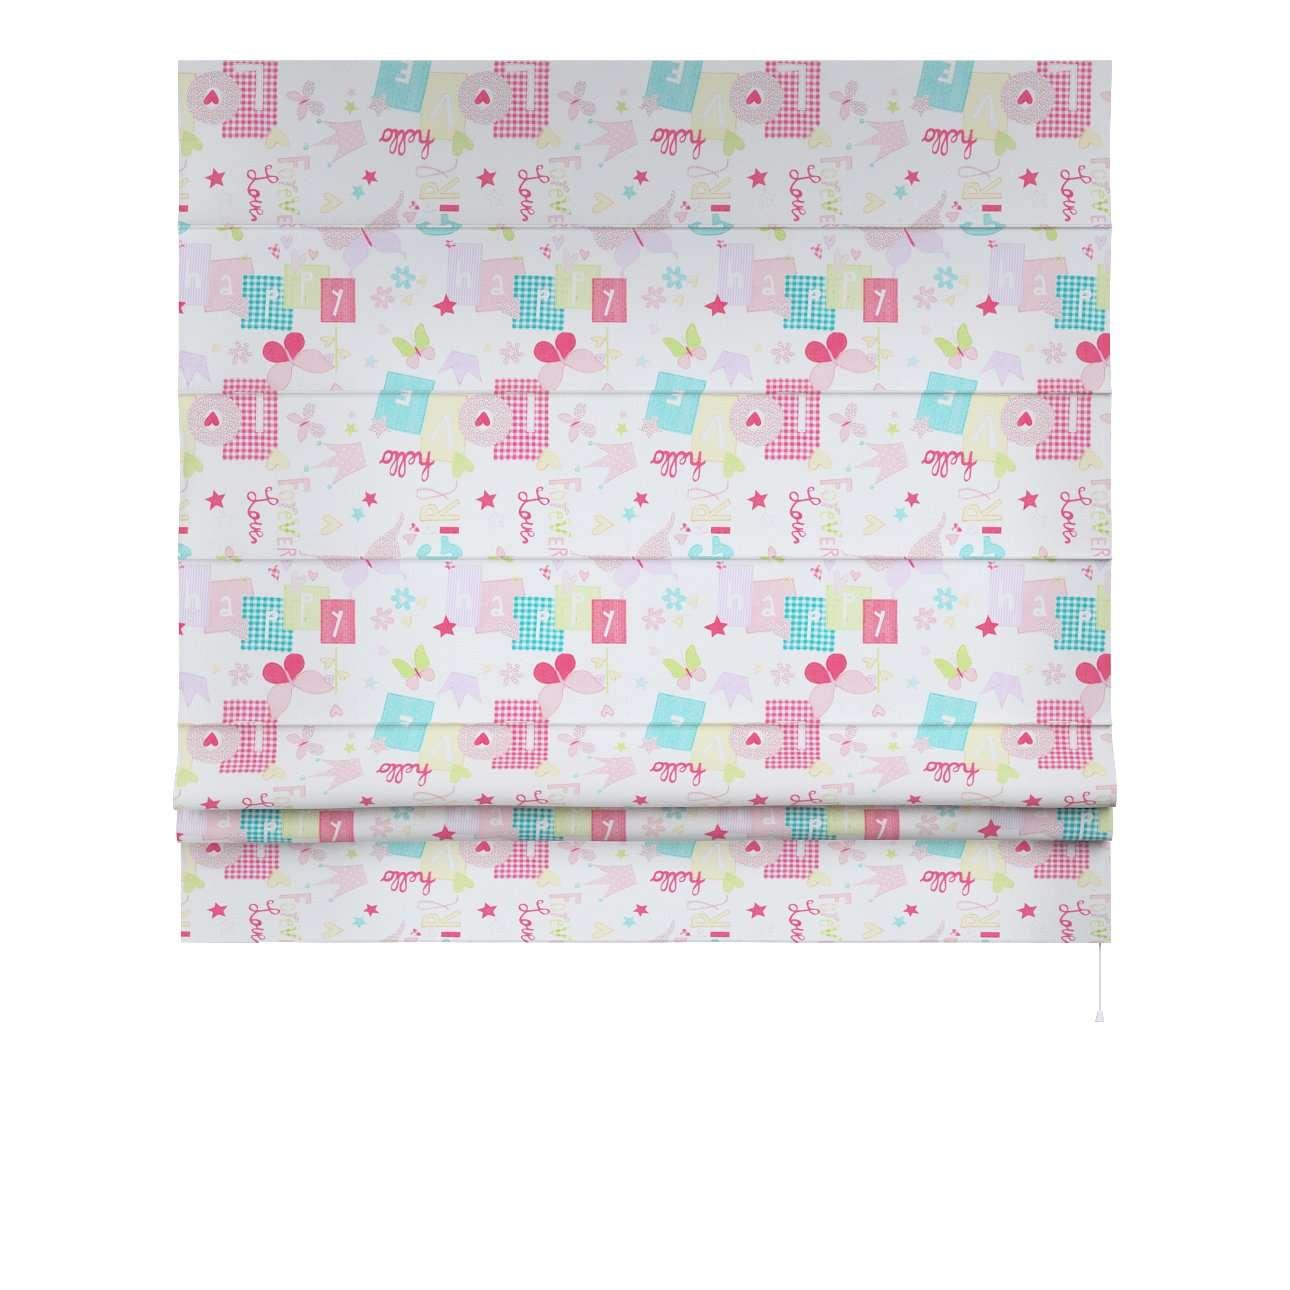 Romanetės Padva 80 x 170 cm (plotis x ilgis) kolekcijoje Little World, audinys: 141-51